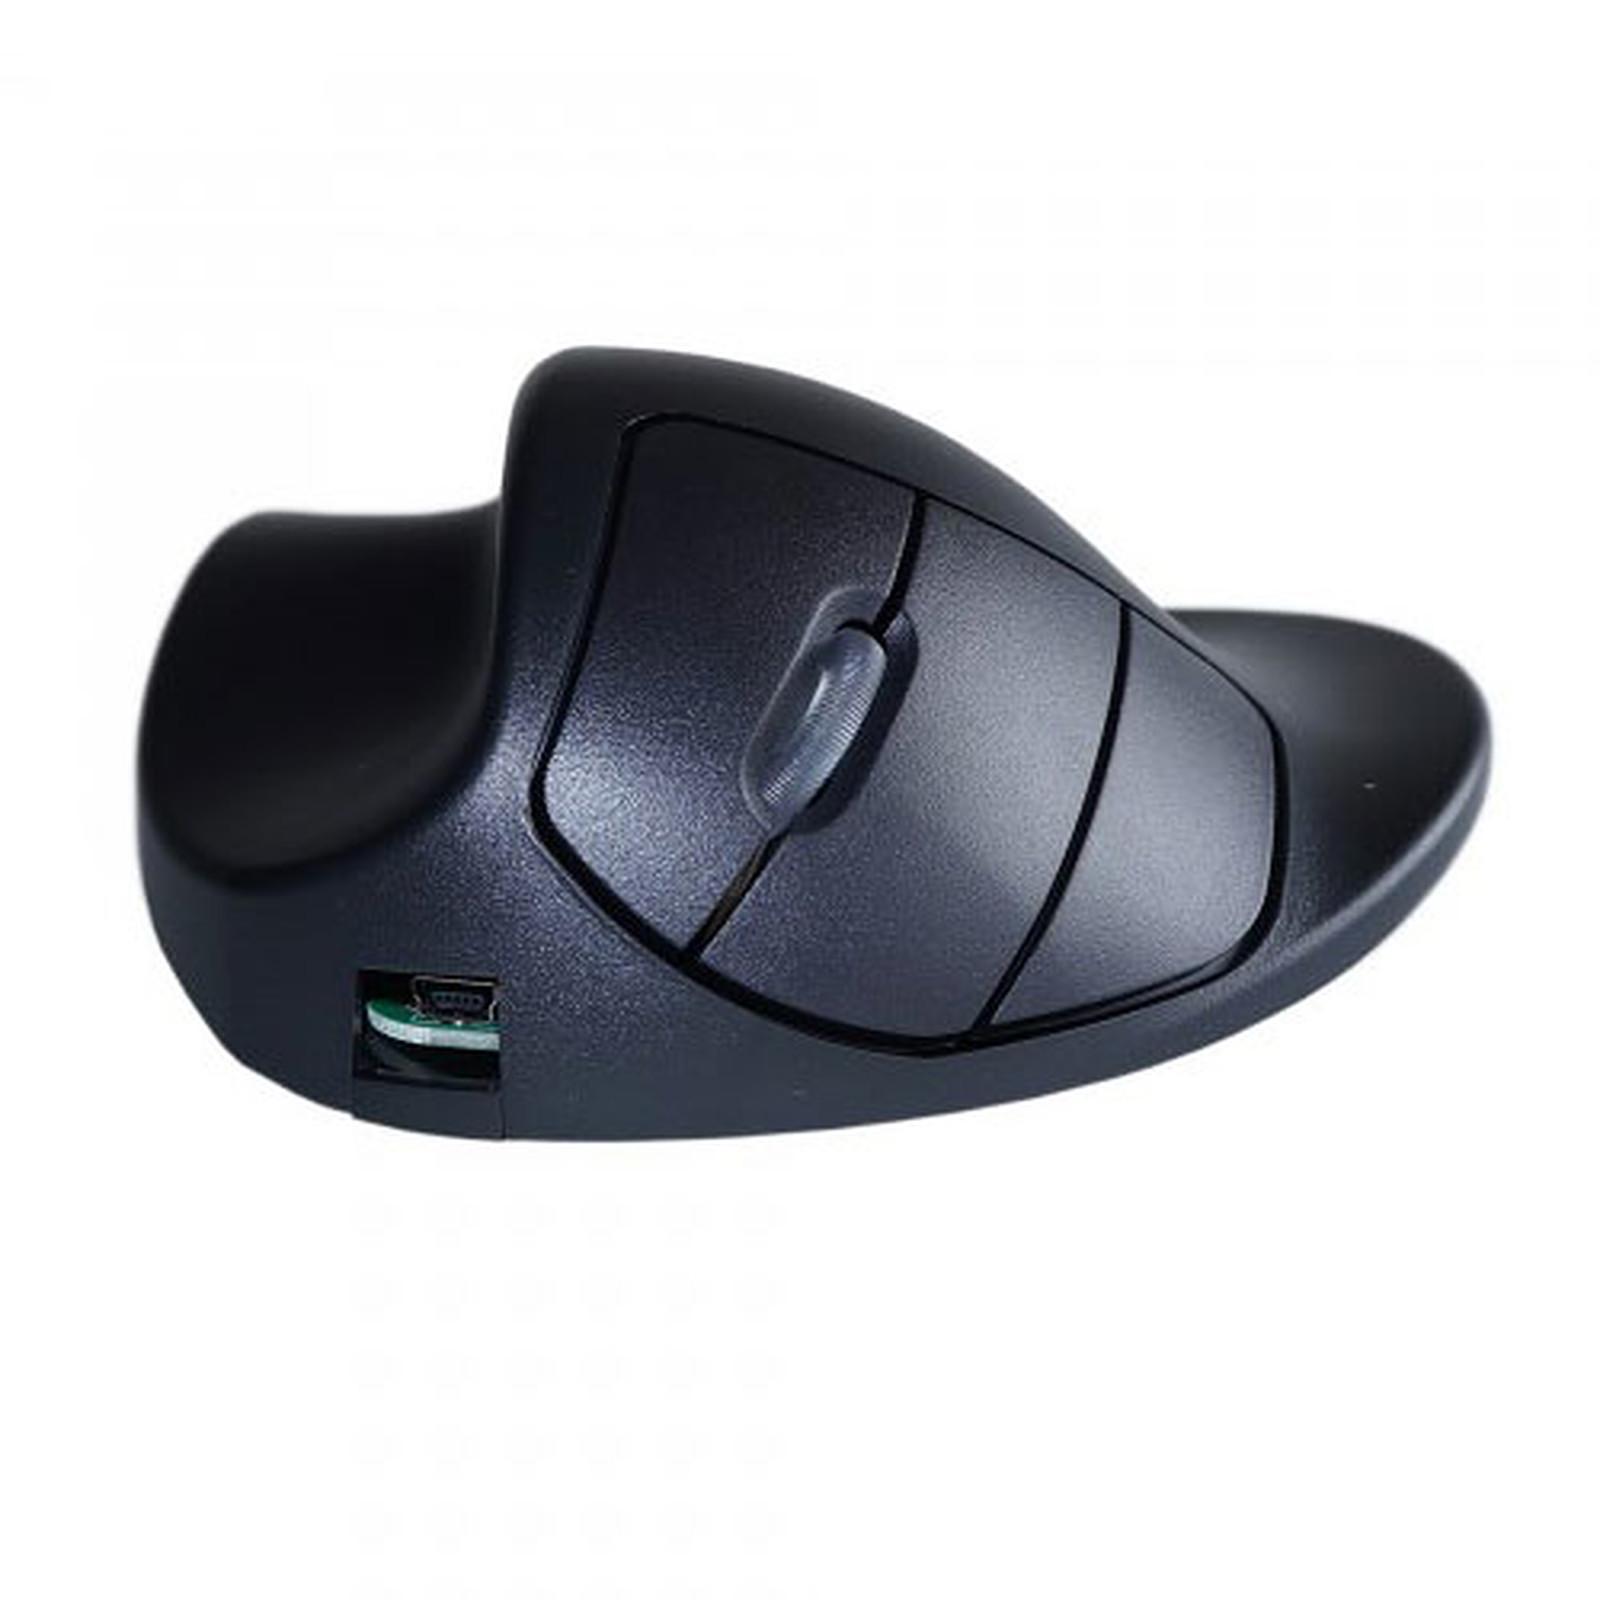 Hippus HandShoe Mouse Wireless Left Hand (Large)